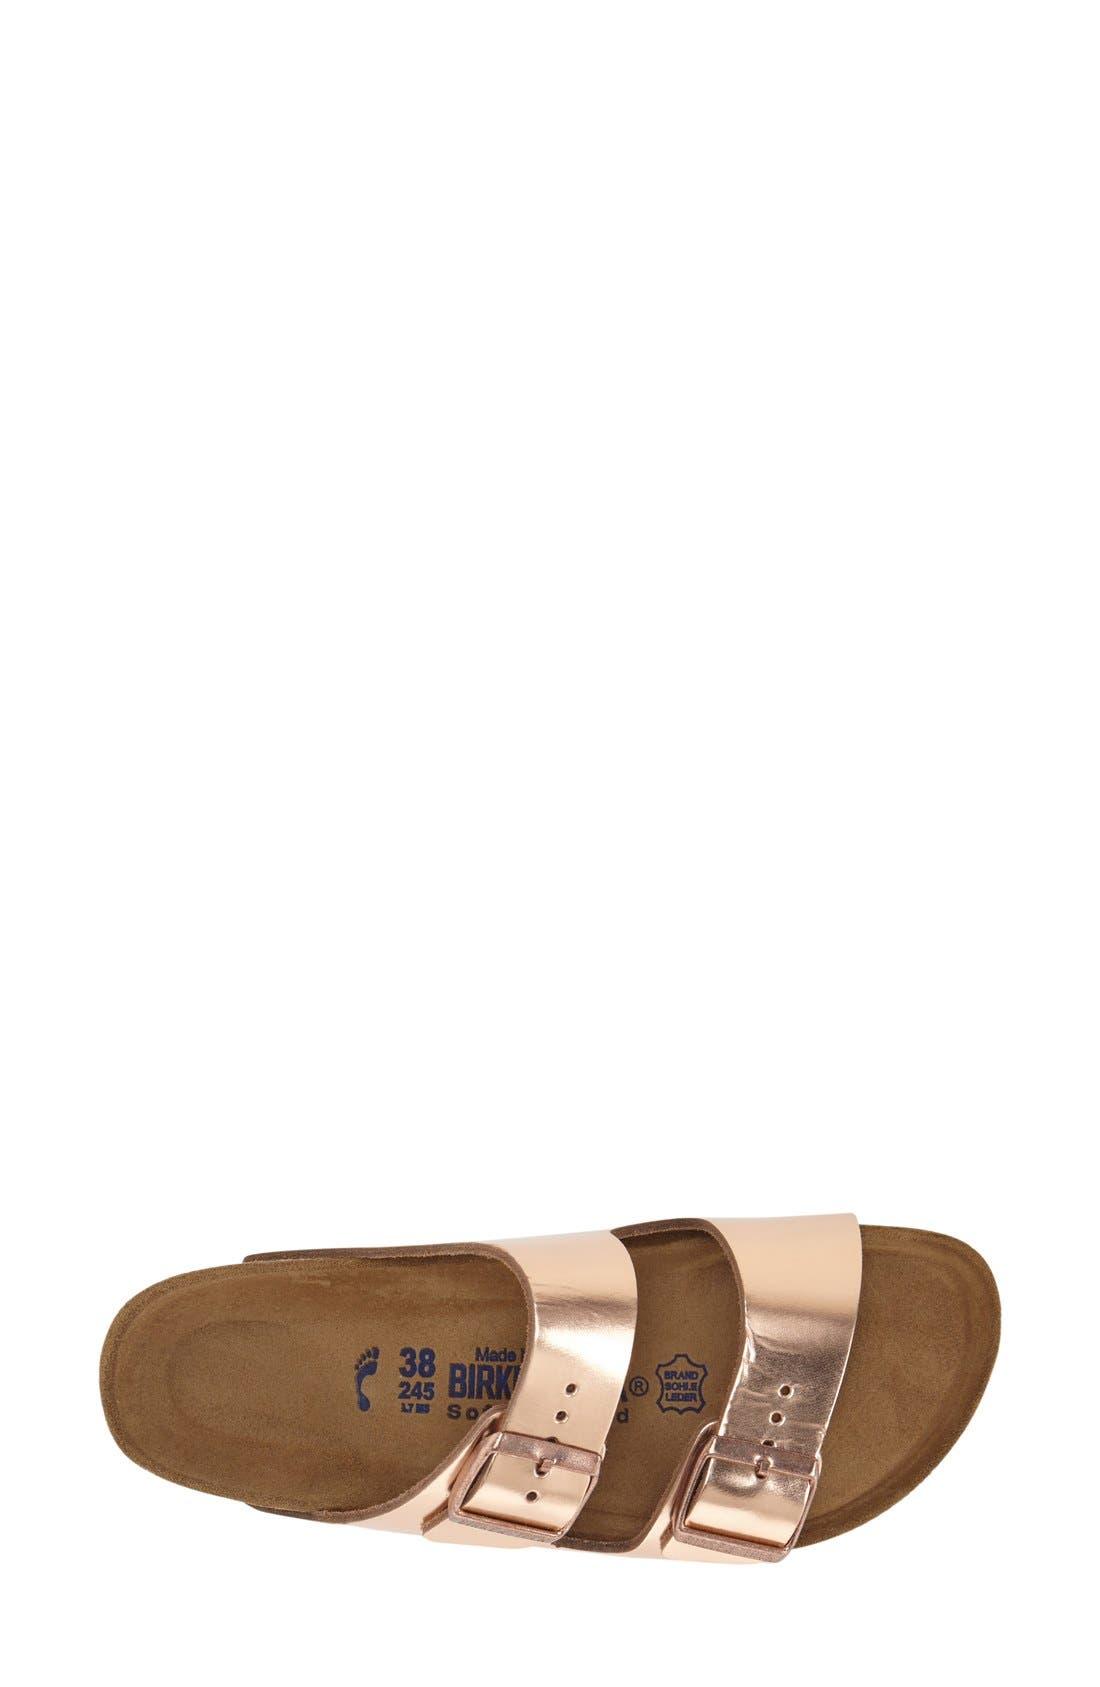 Alternate Image 3  - Birkenstock 'Arizona' Patent Leather Sandal (Women)